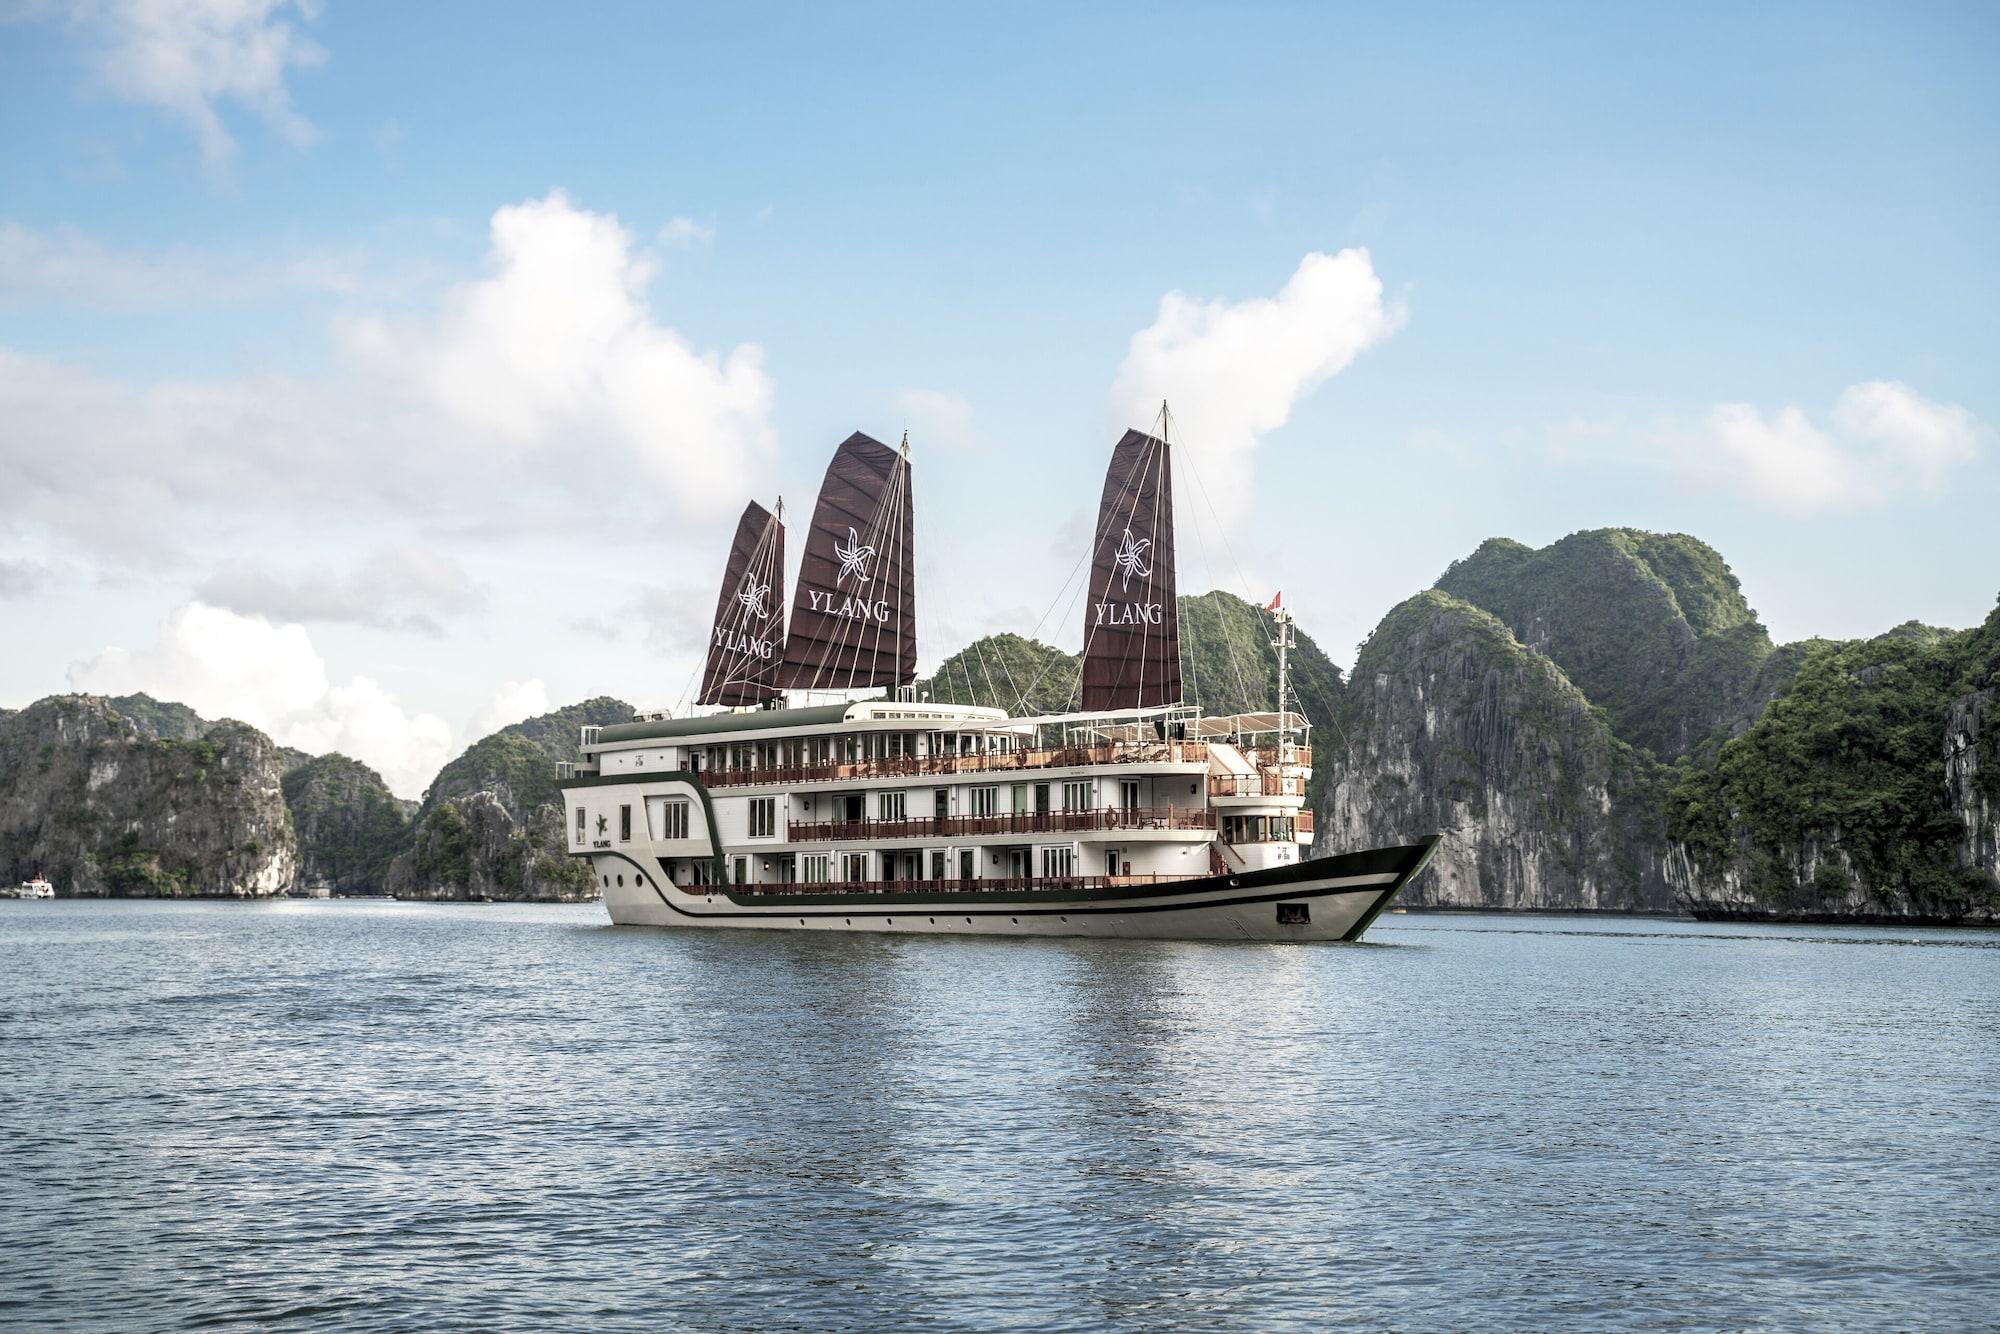 Heritage Line Ylang Cruise, Hạ Long